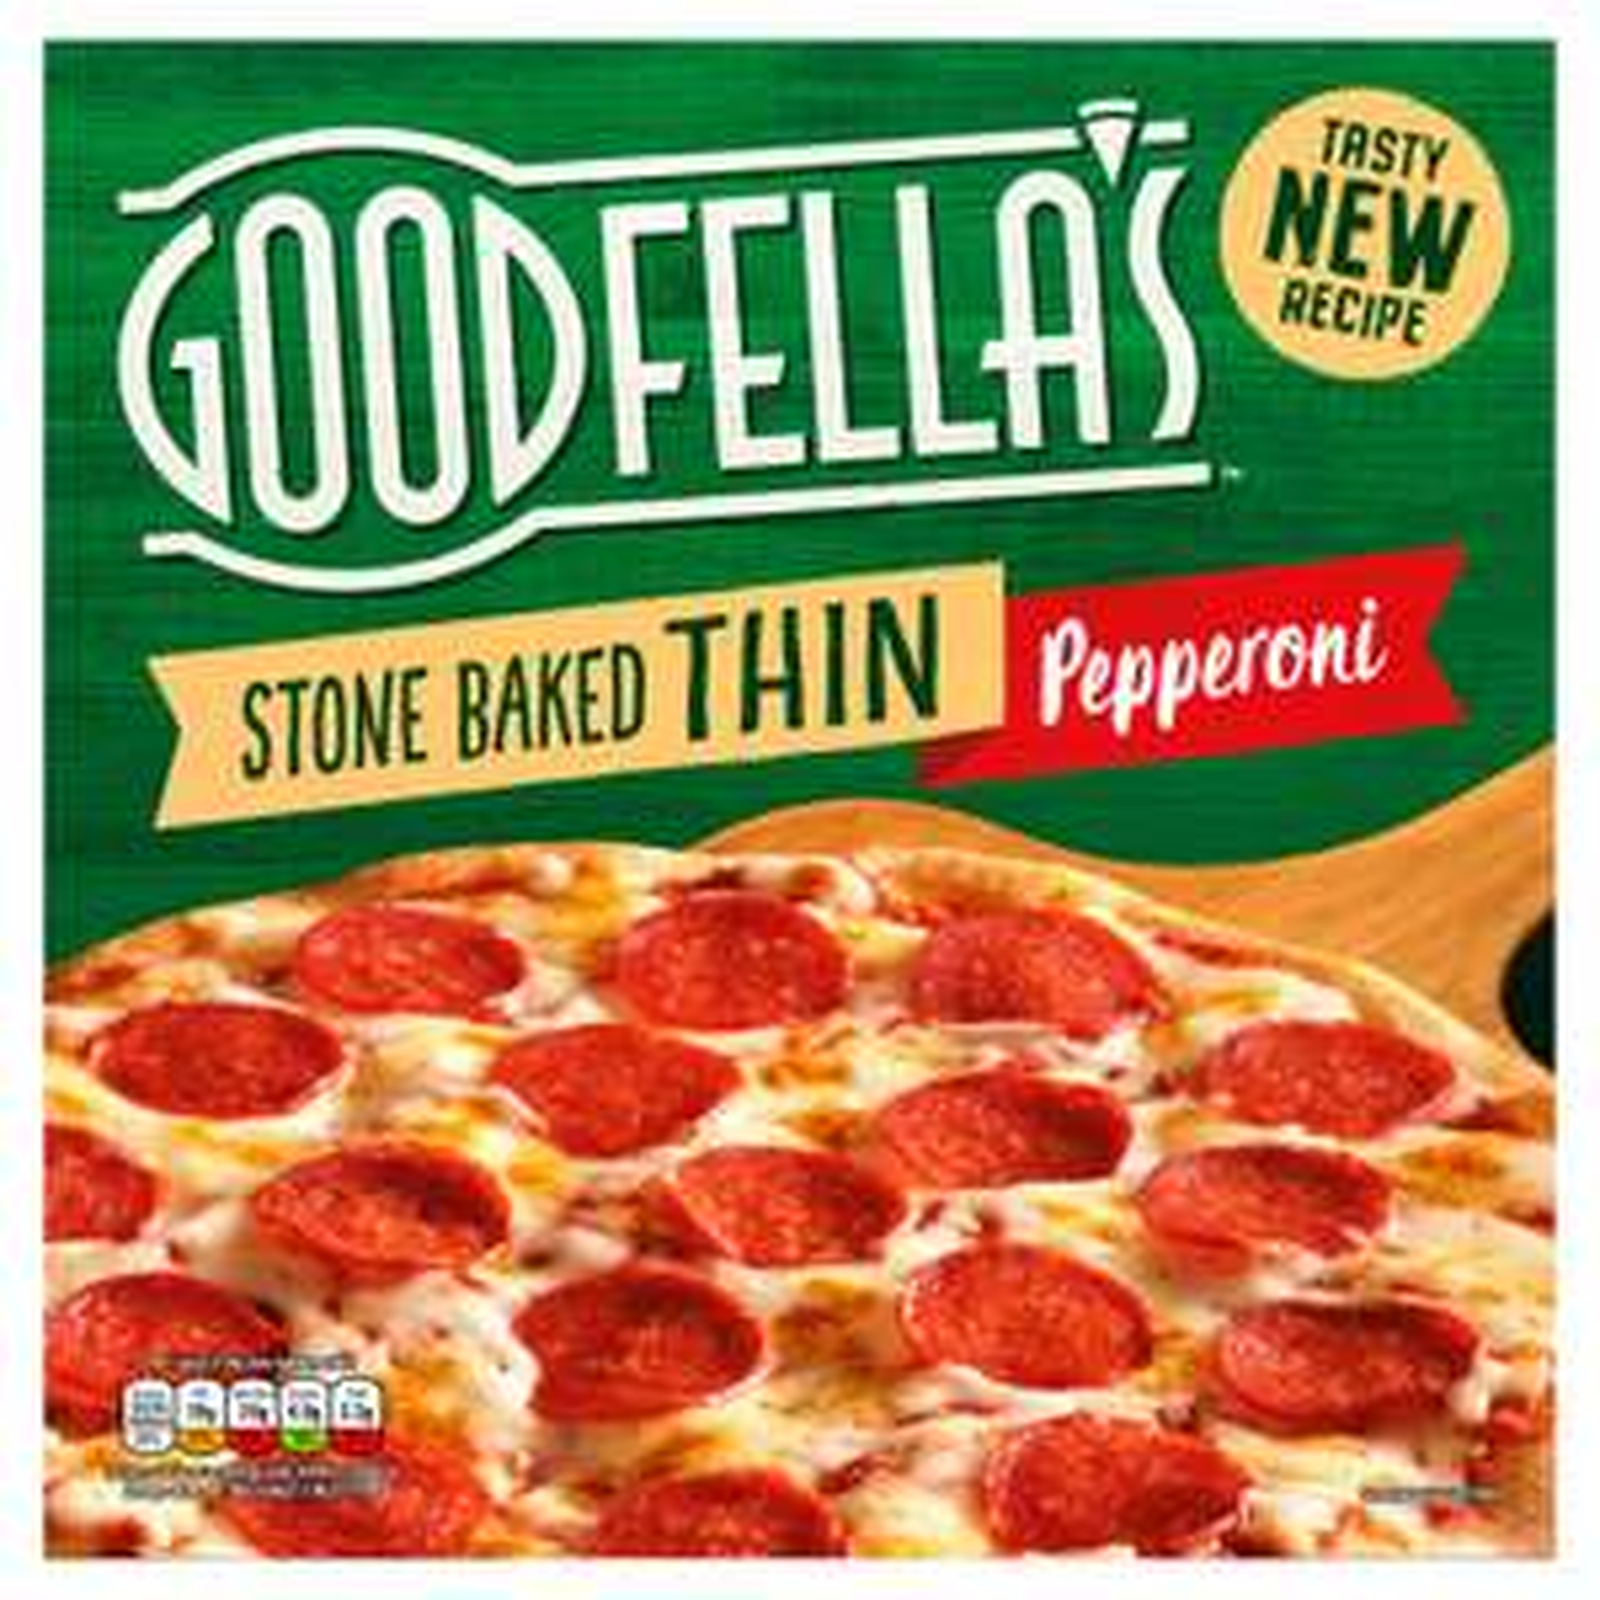 Half Price Goodfellas Pizza - Iceland - £1